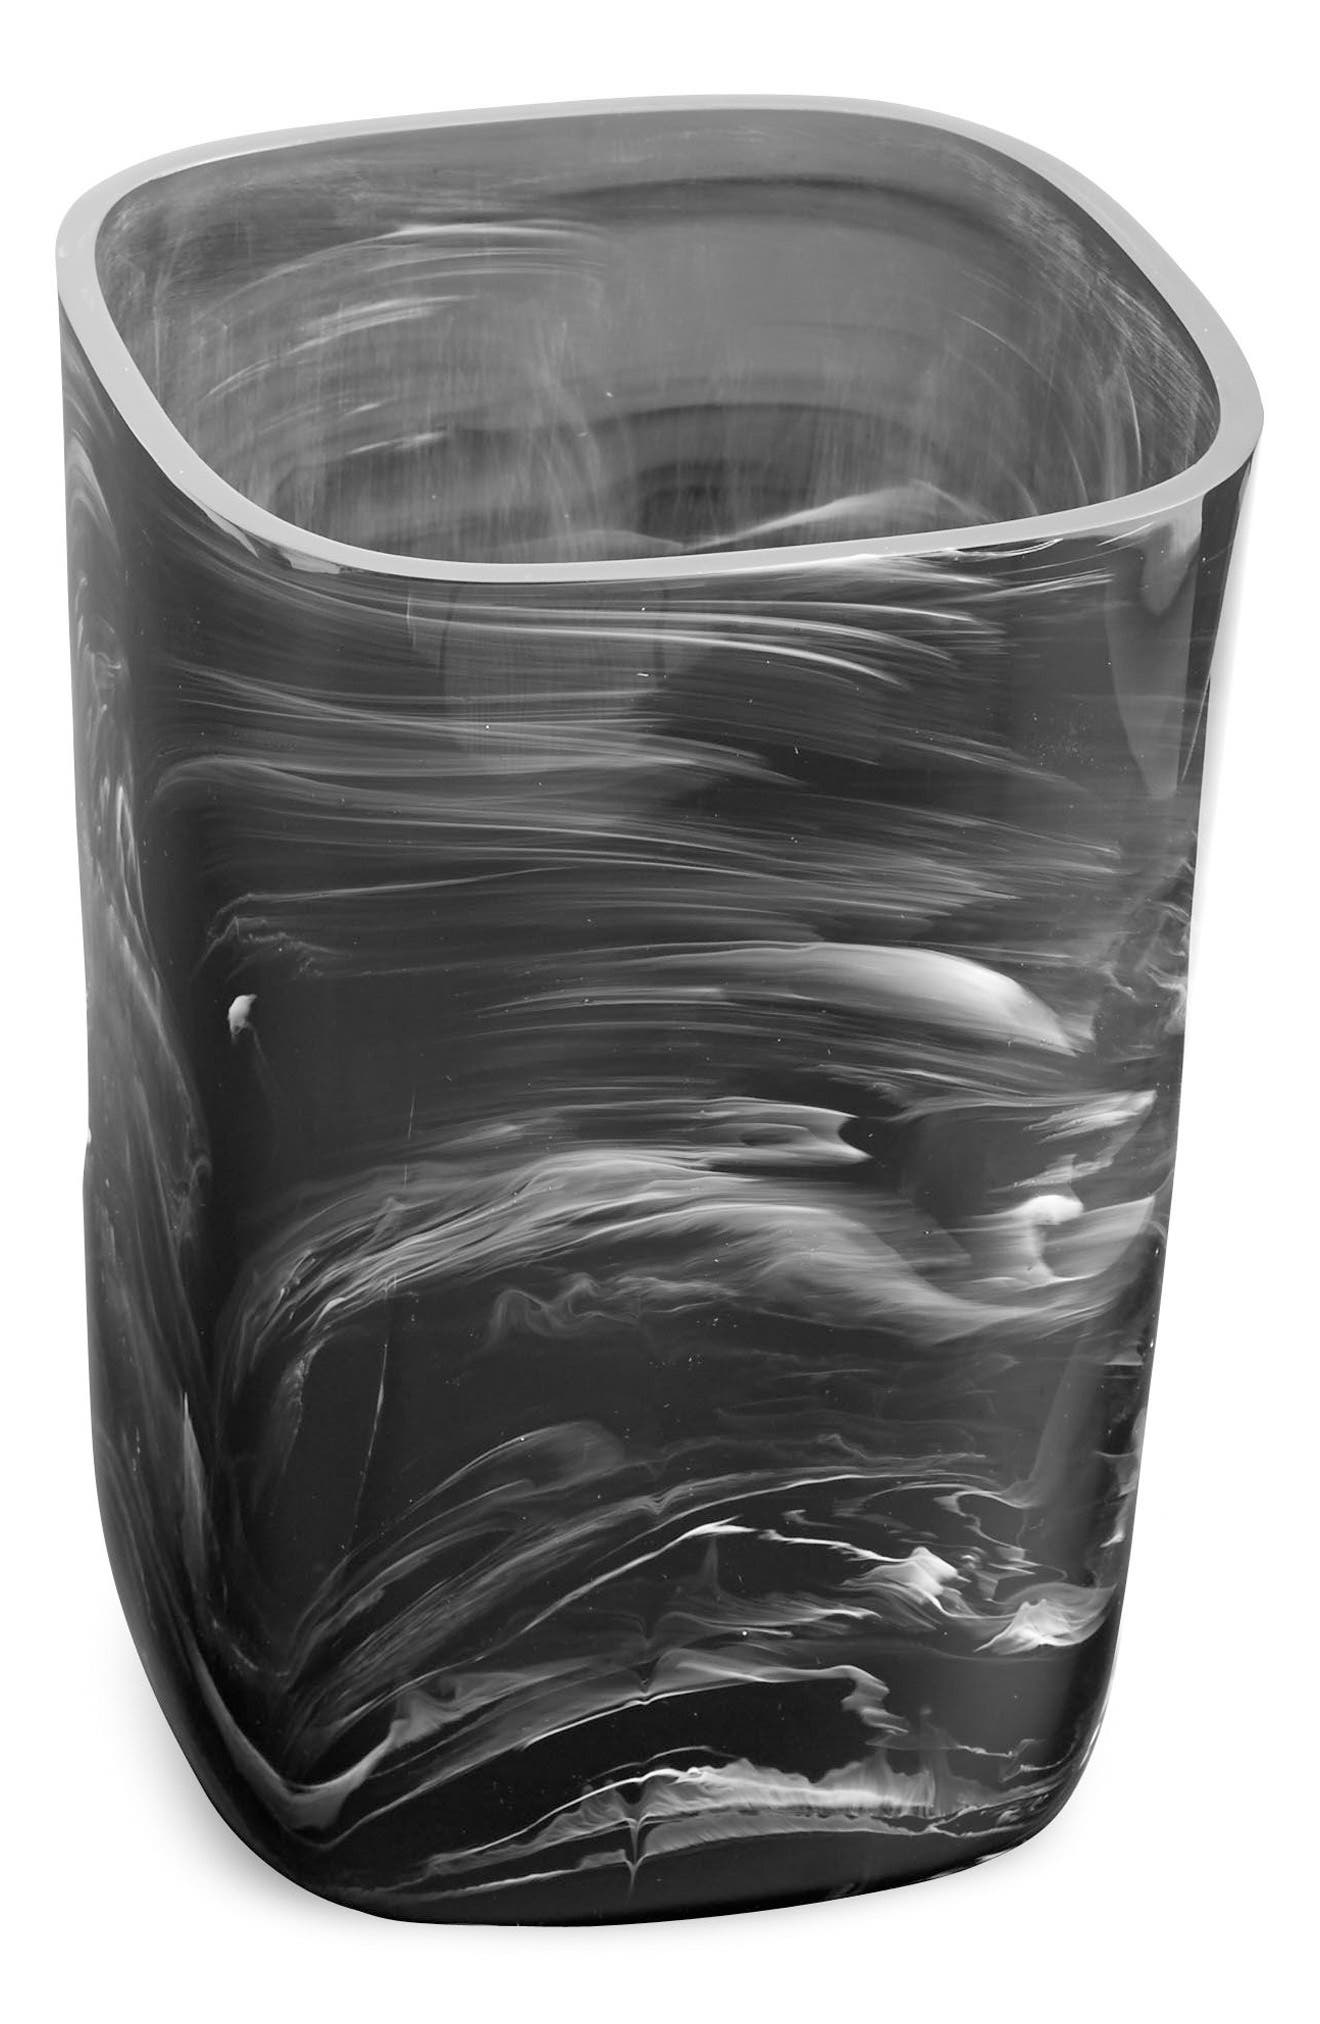 Murano Wastebasket,                         Main,                         color, Black/ White